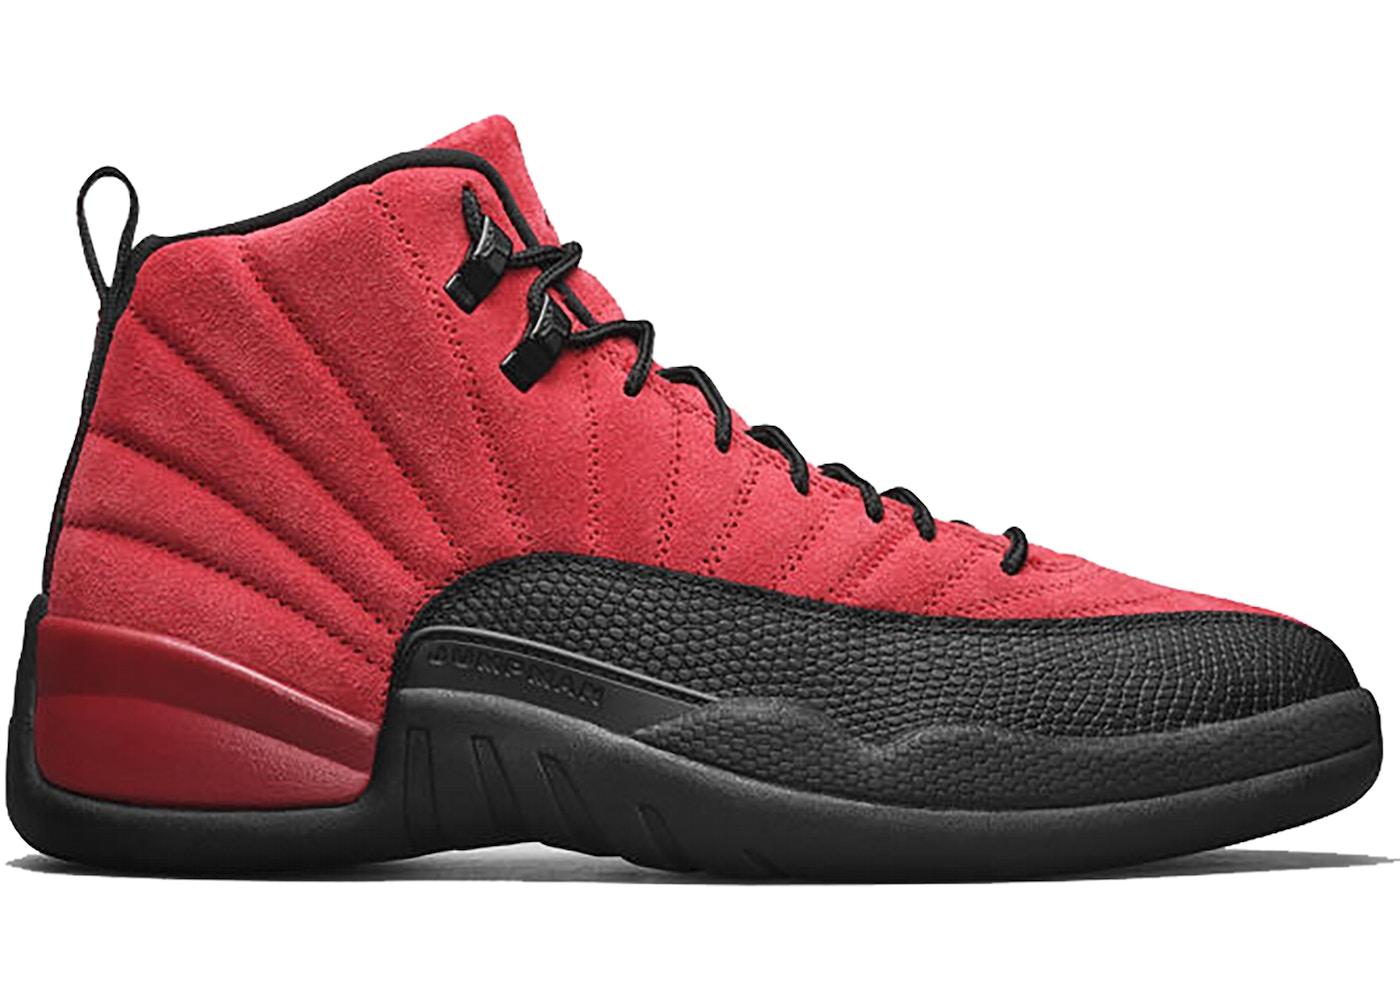 Jordan 12 Retro Reverse Flu Game